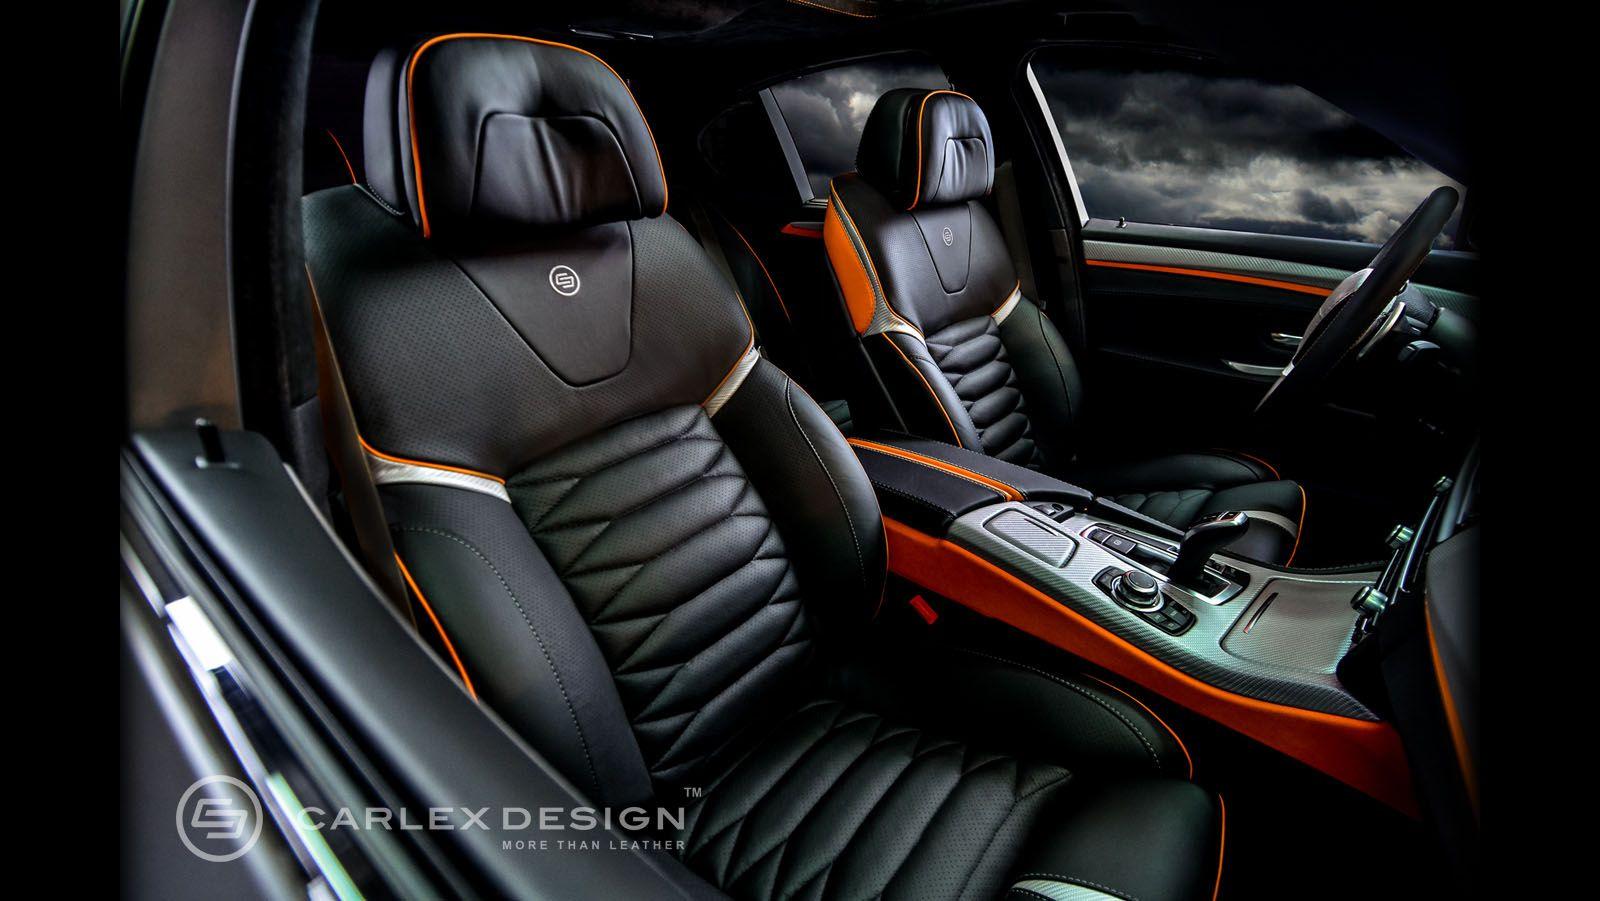 Bmw F10 Custom Interior Carlex Design With Images Car Seats